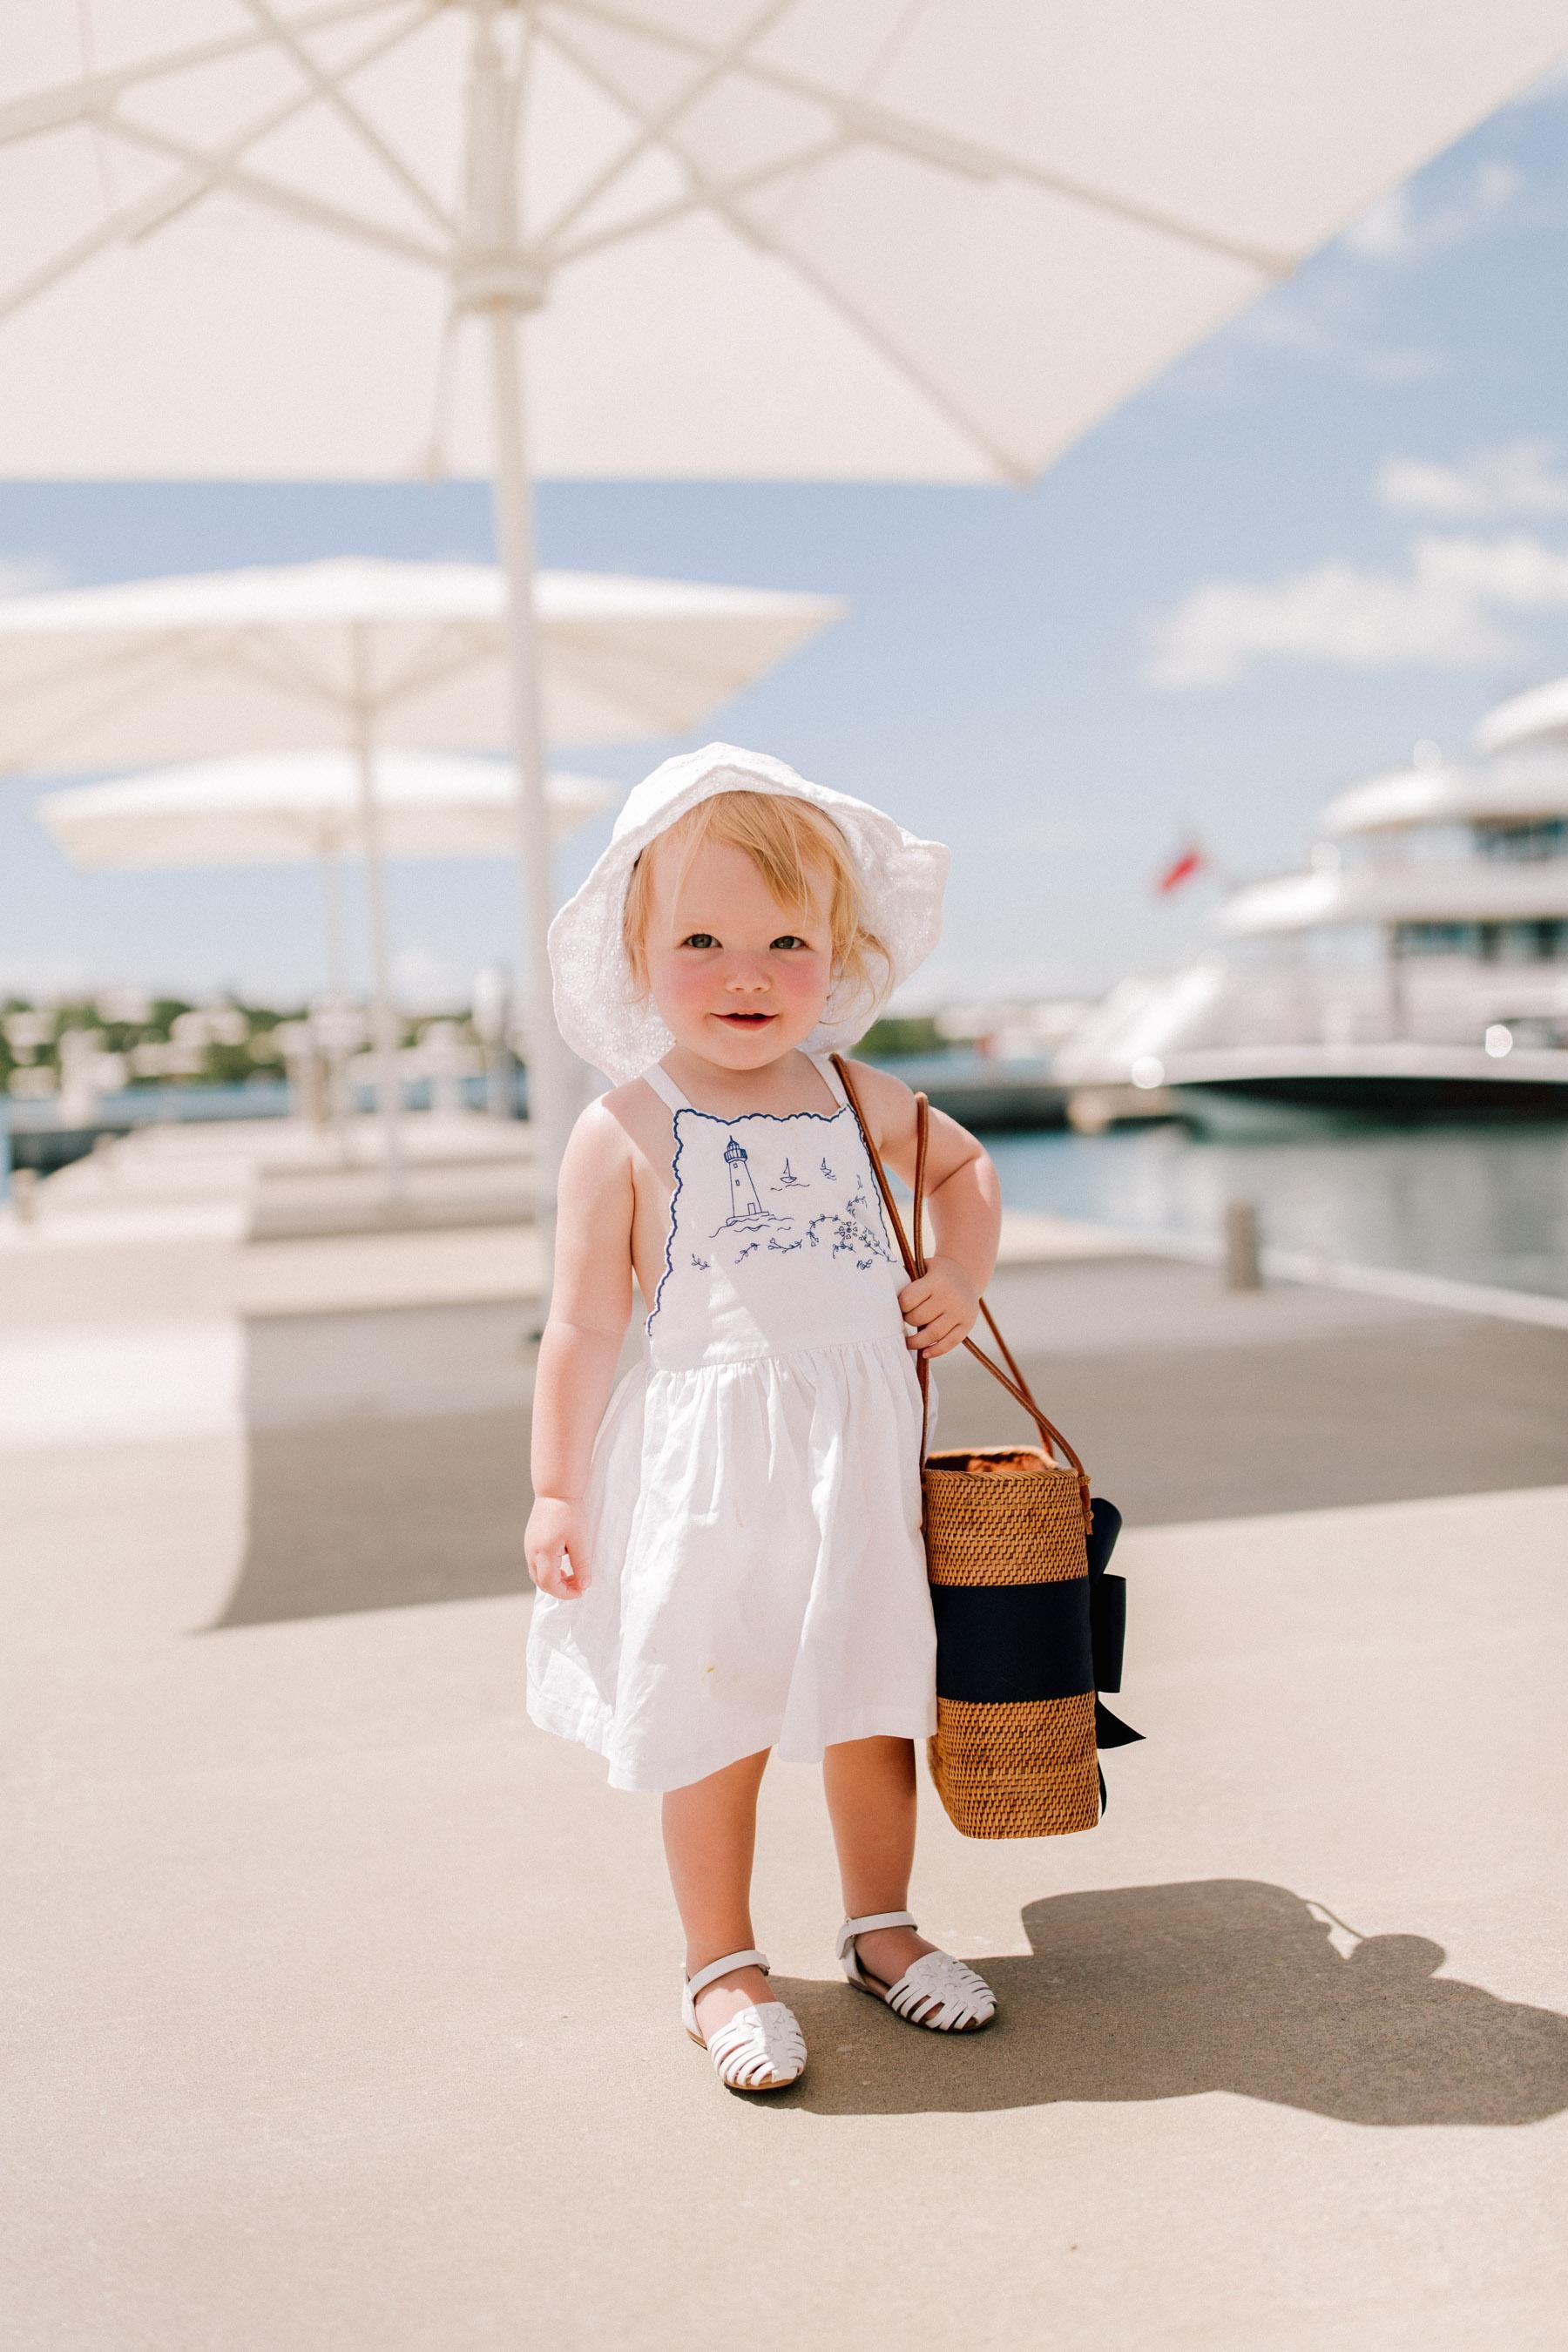 Emma is wearing a Embroidered Cotton Dress - Ralph Lauren